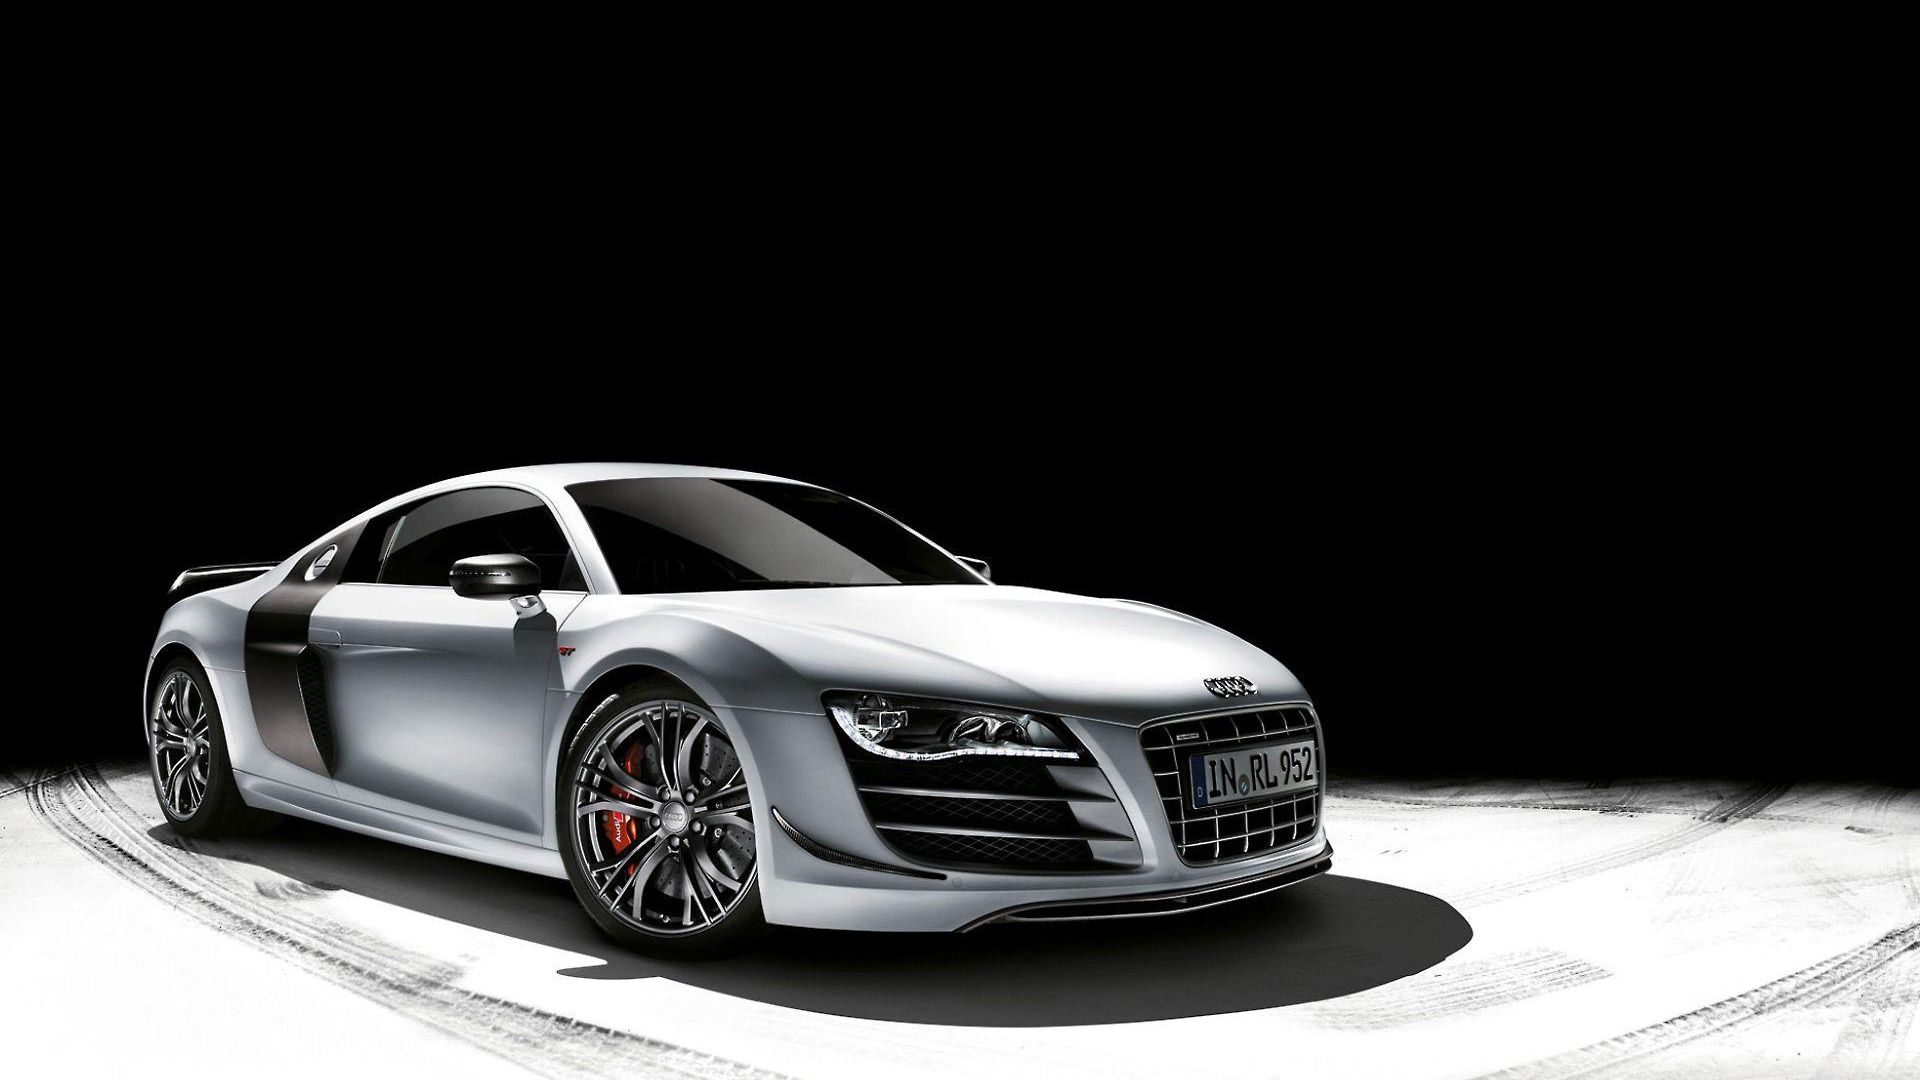 39 Best Free Audi R8 Hd Wallpapers Wallpaperaccess